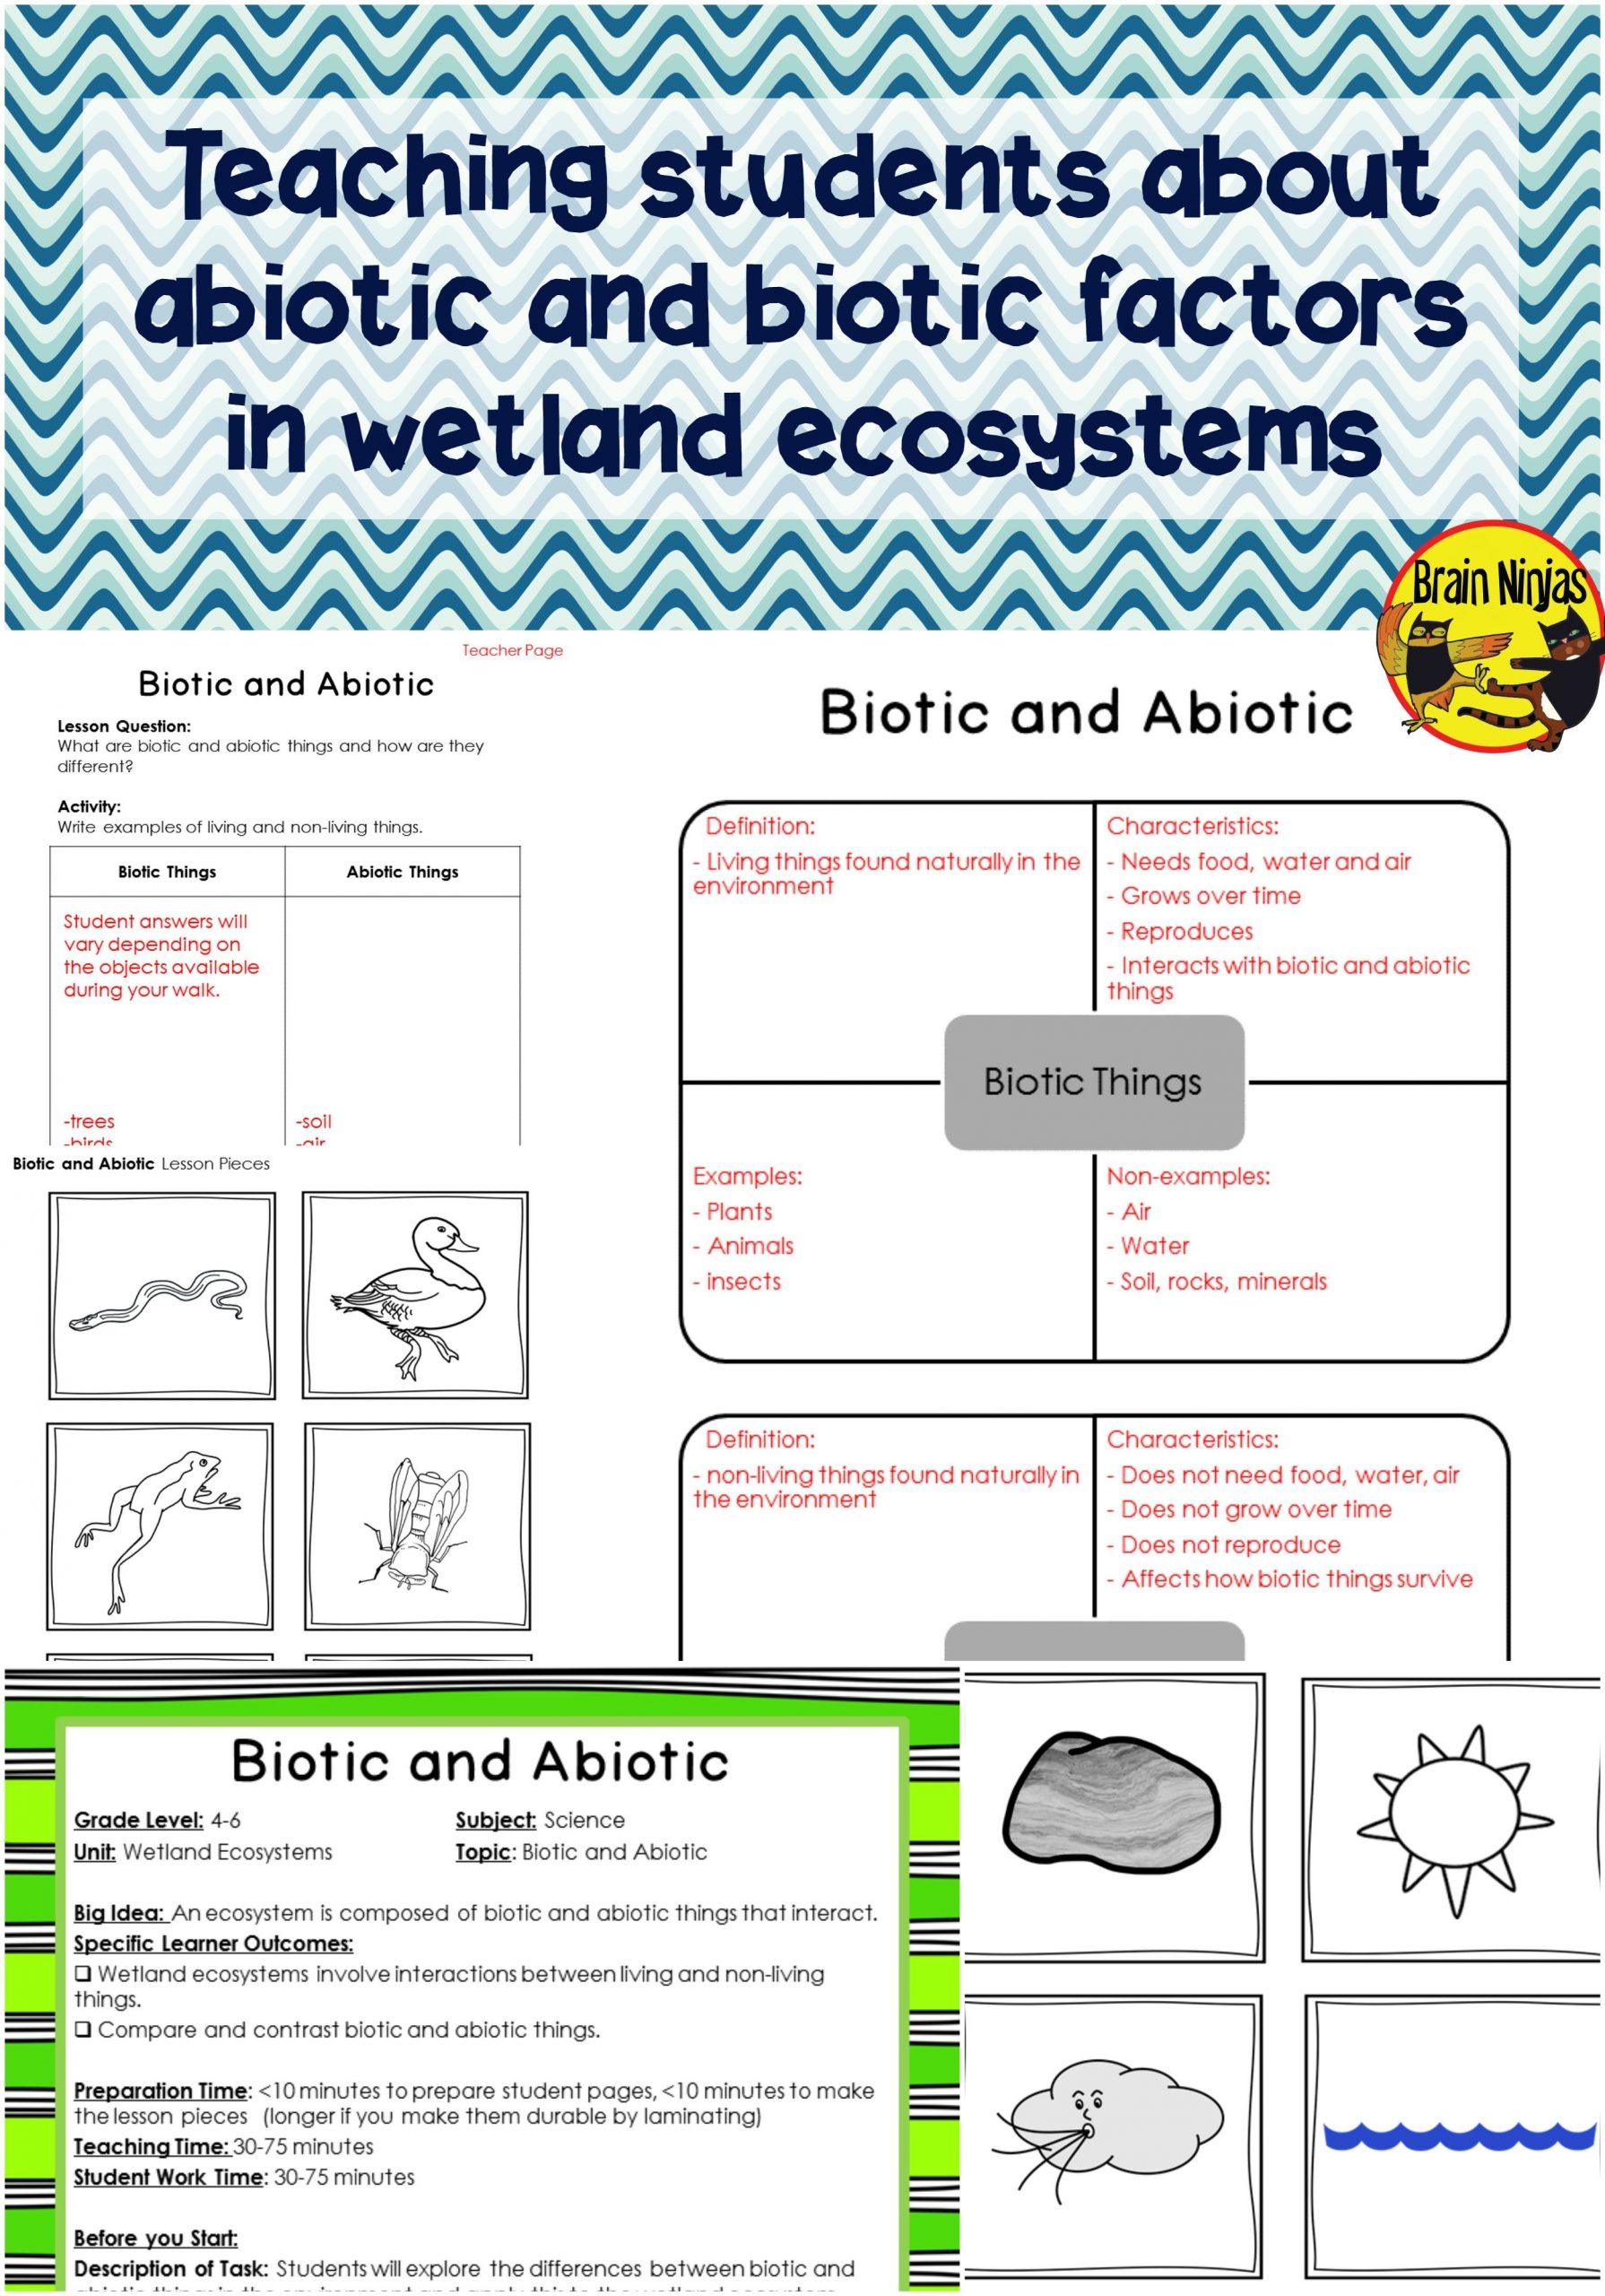 Abiotic Vs Biotic Factors Worksheet Answers Wetlands Biotic and Abiotic Interactions